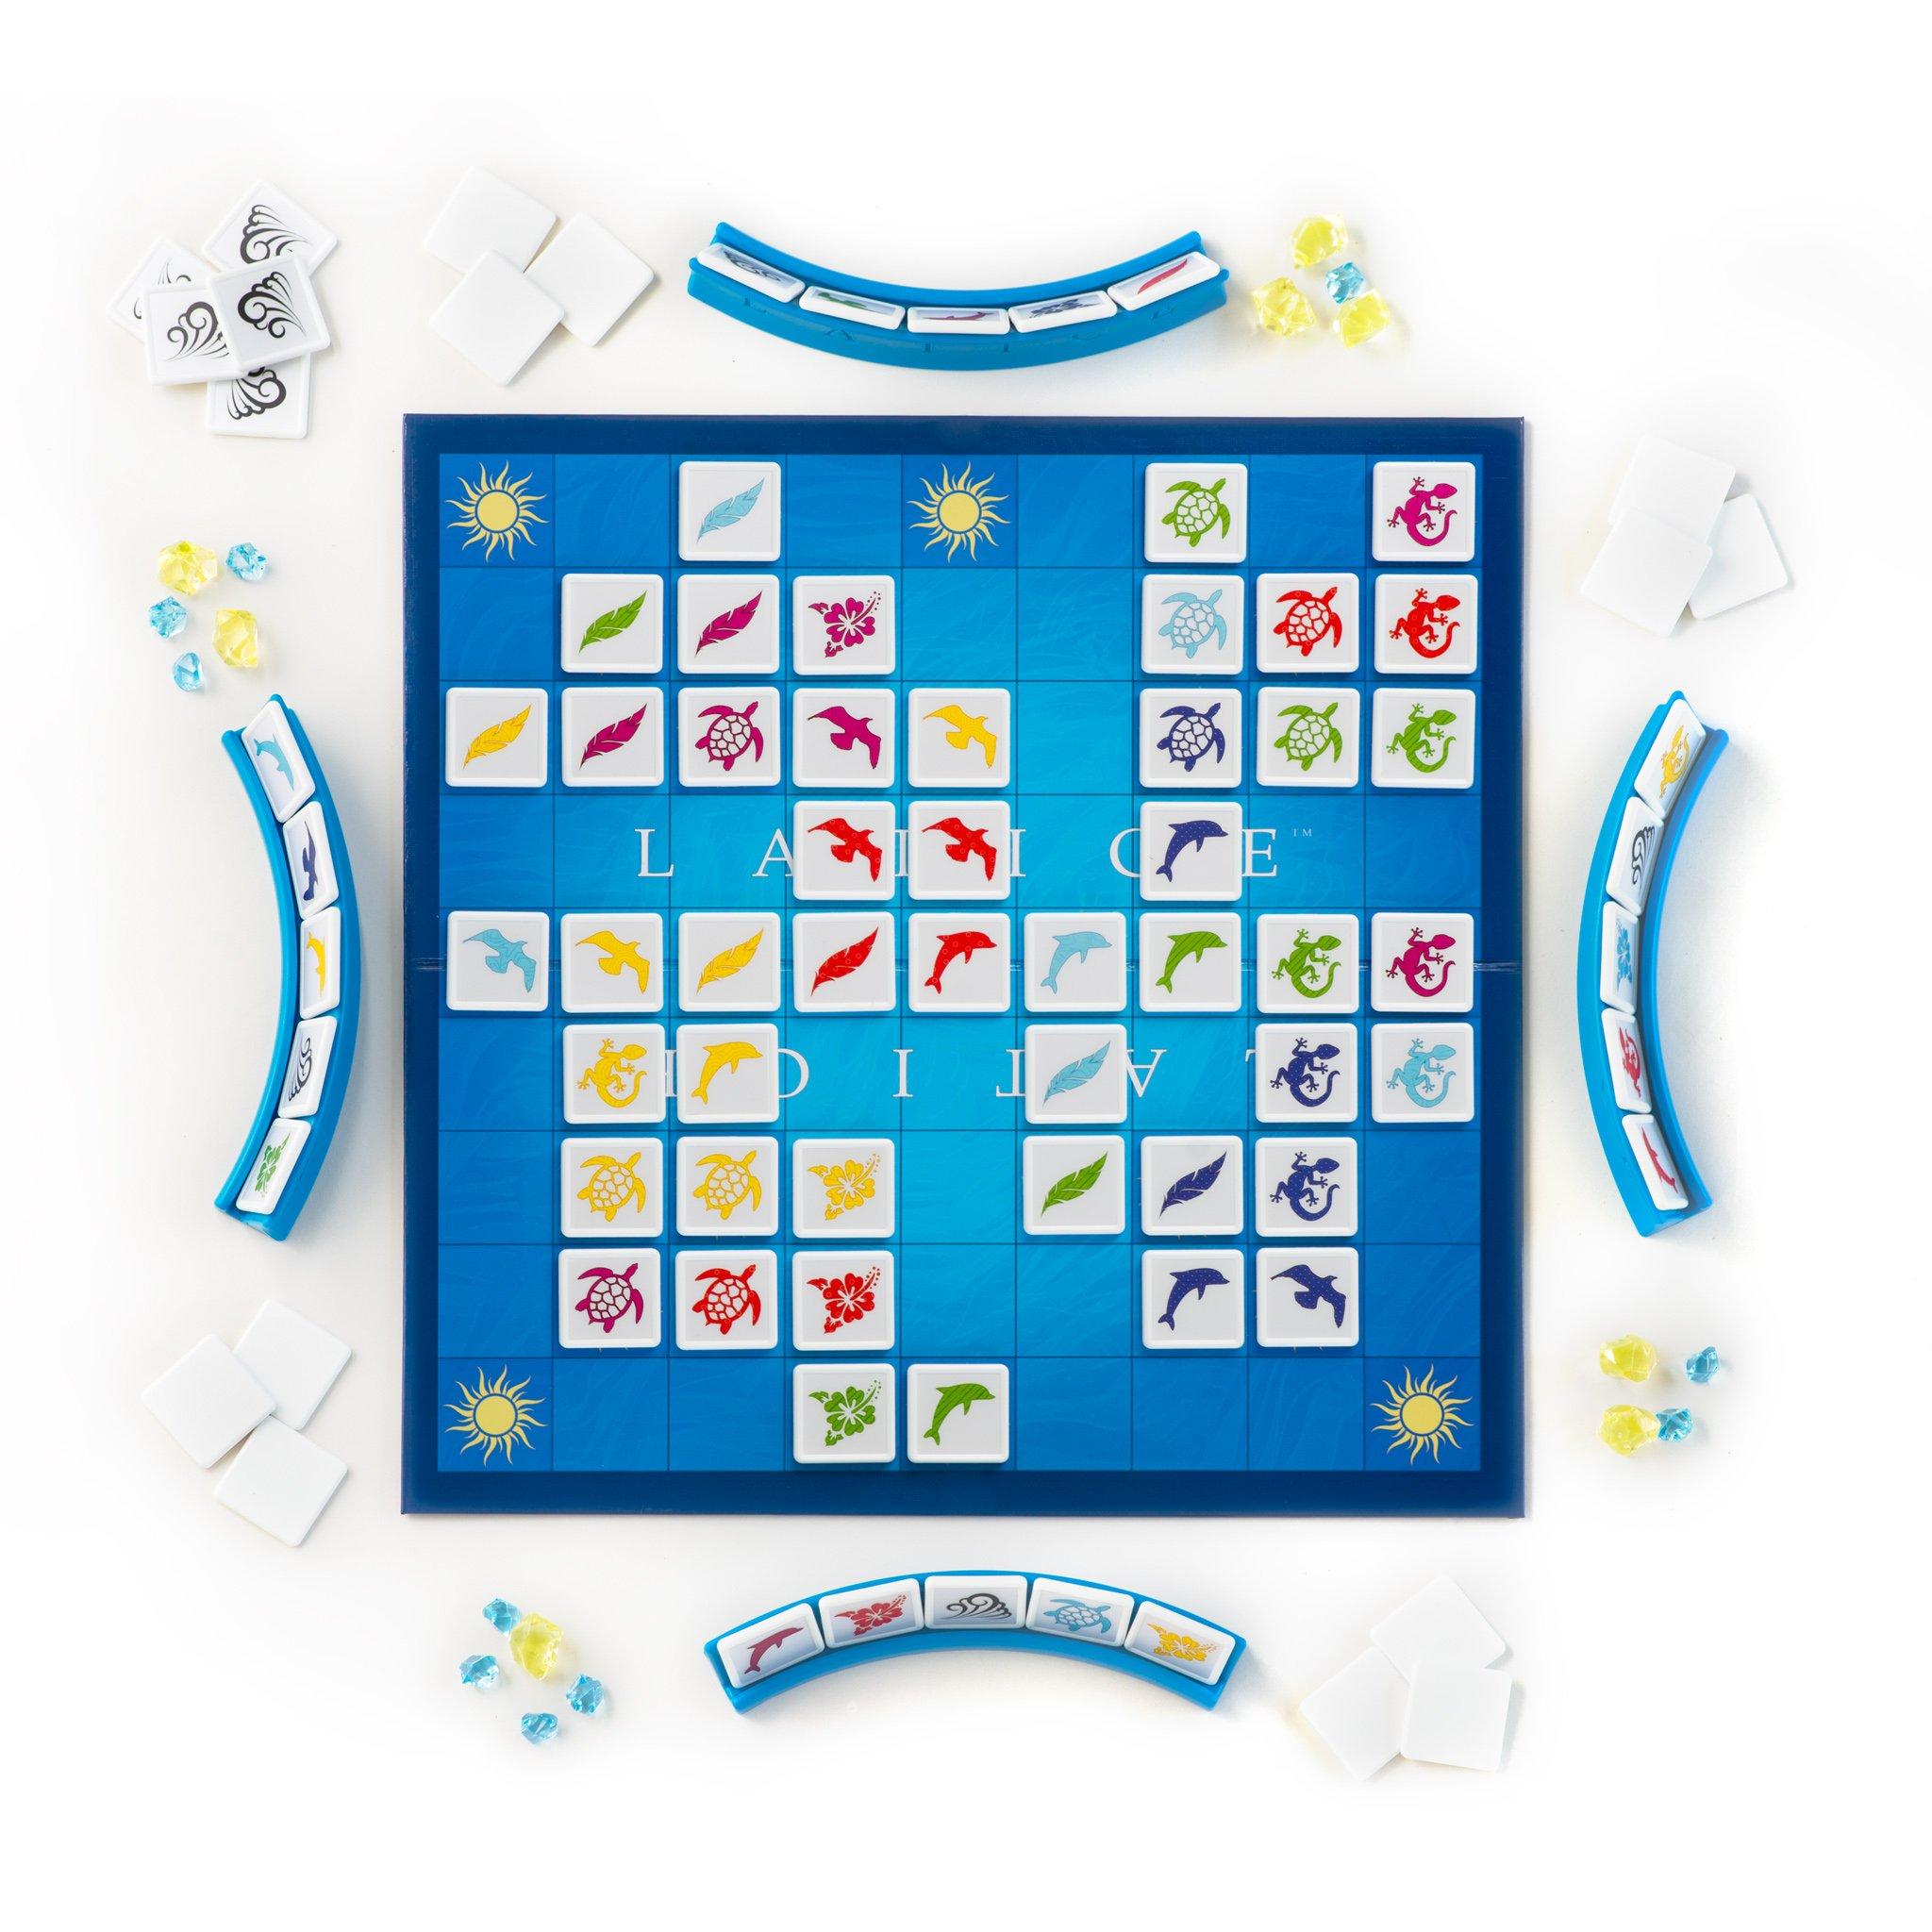 Latice Deluxe - Brettspiel (Neuauflage)